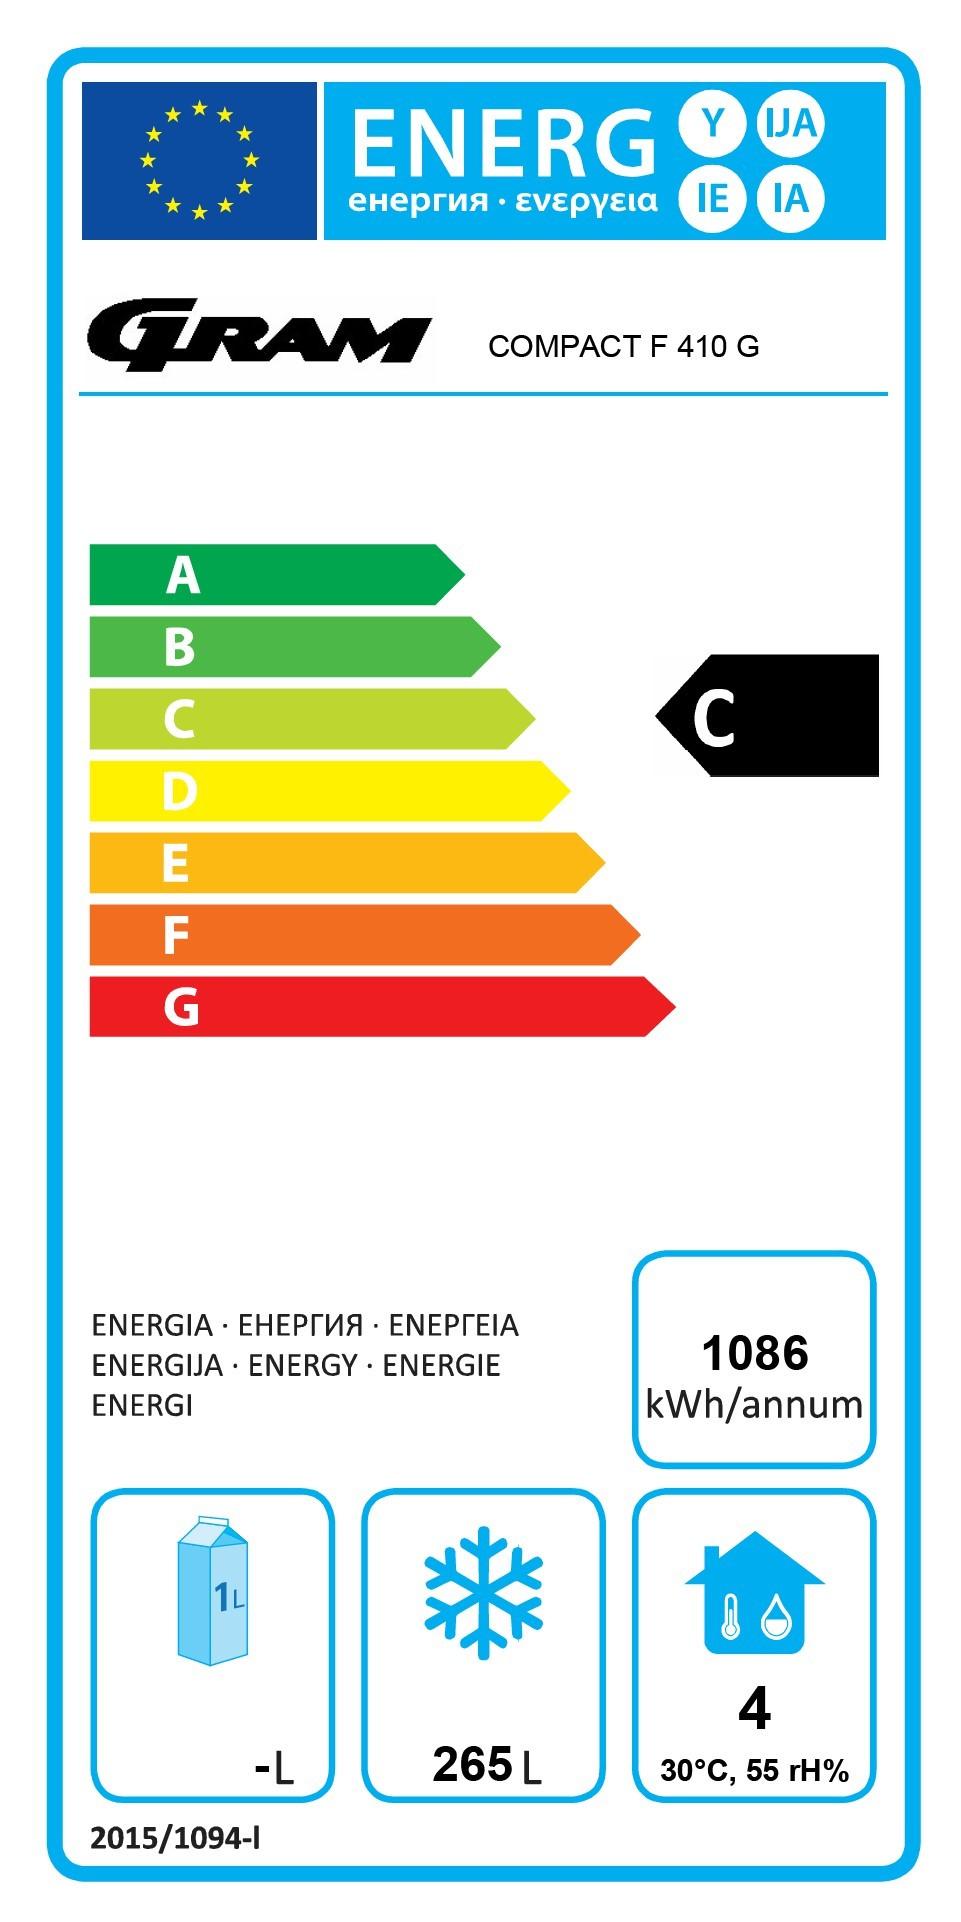 COMPACT F 410 LG C 6W 346 Ltr Upright Freezer Energy Rating